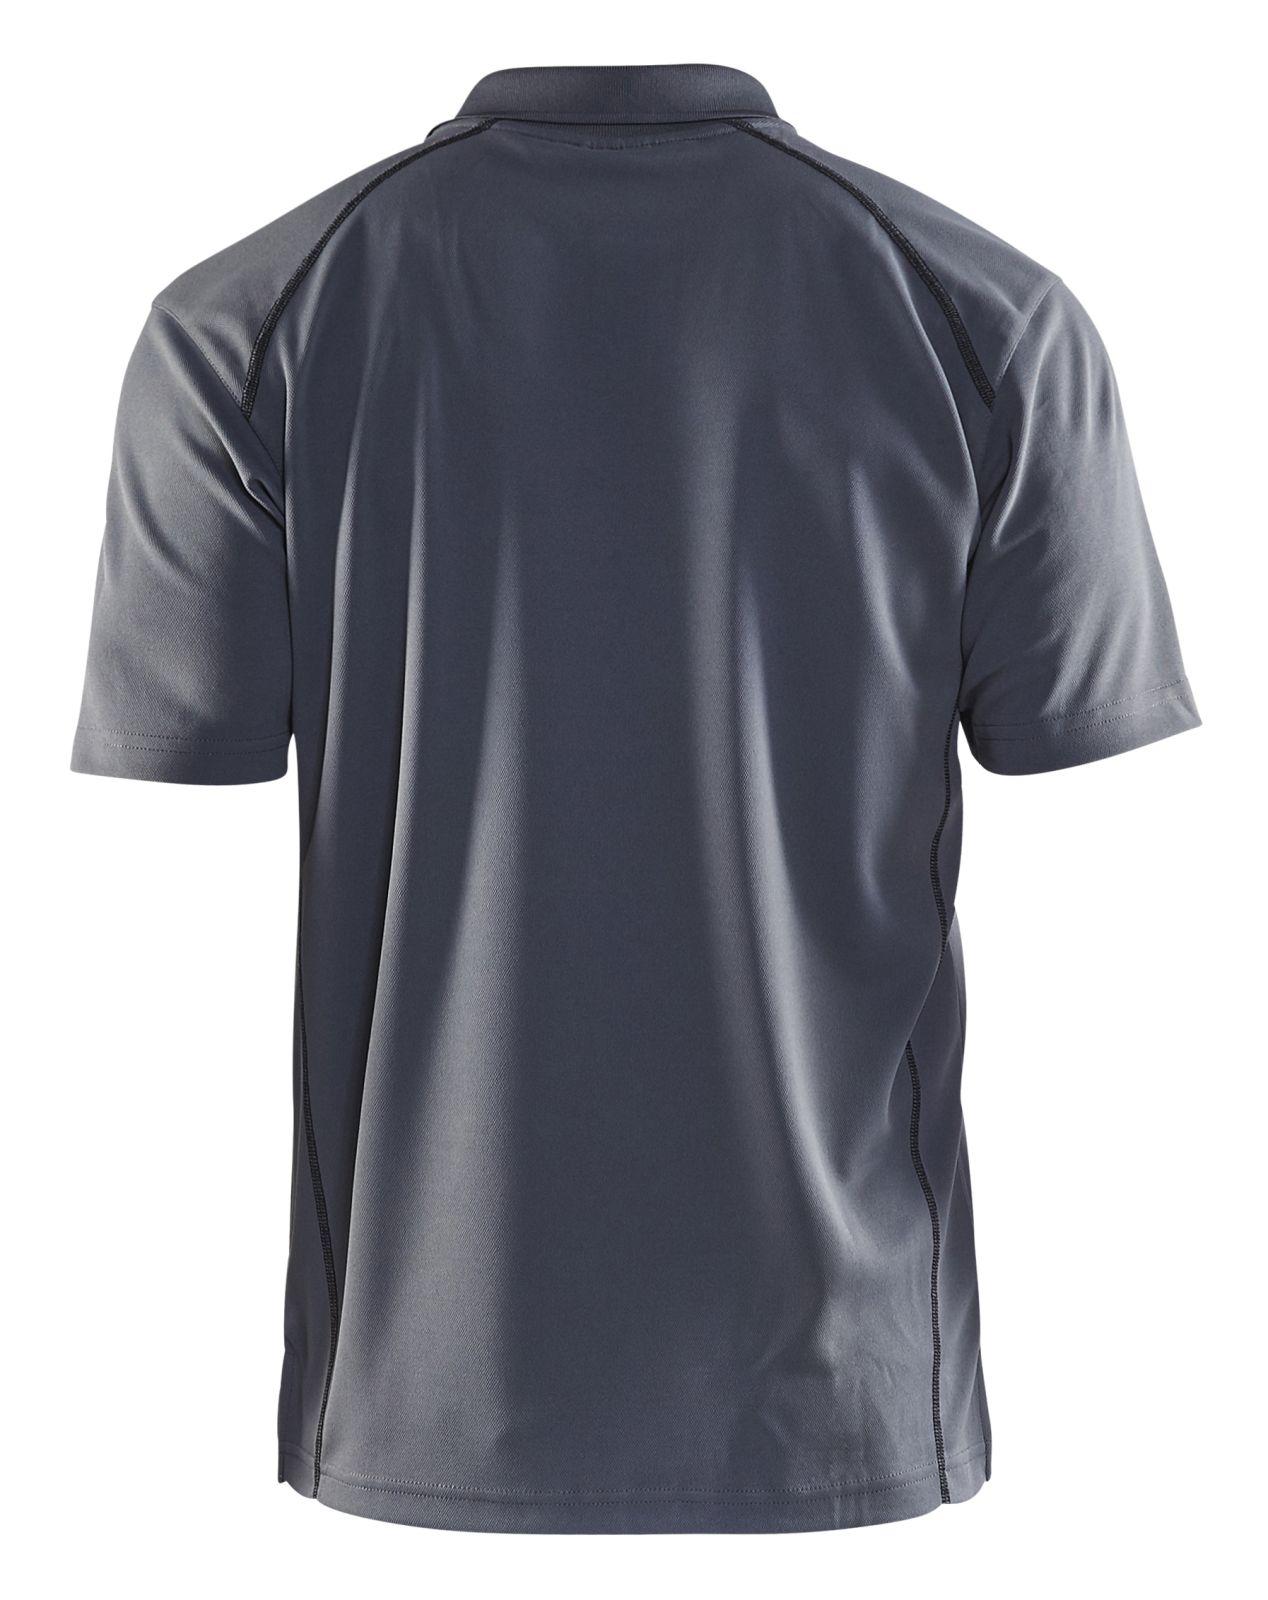 Blaklader Poloshirts 33261051 grijs(9400)